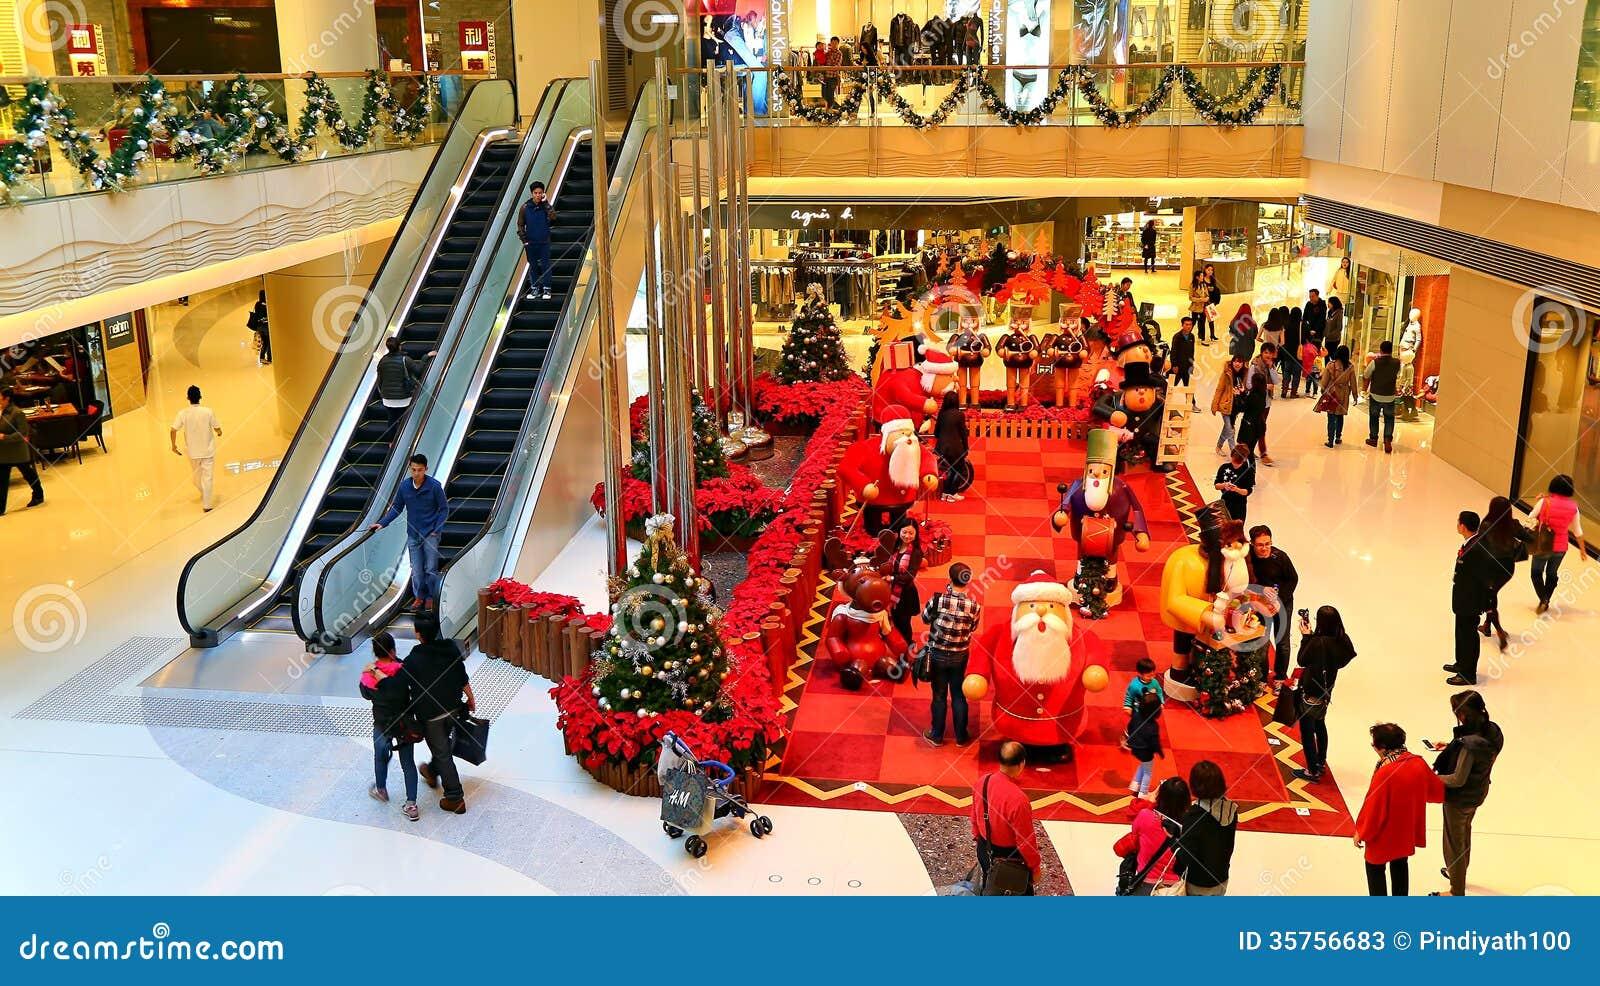 christmas decoration shopping mall active visitors enjoying decorations